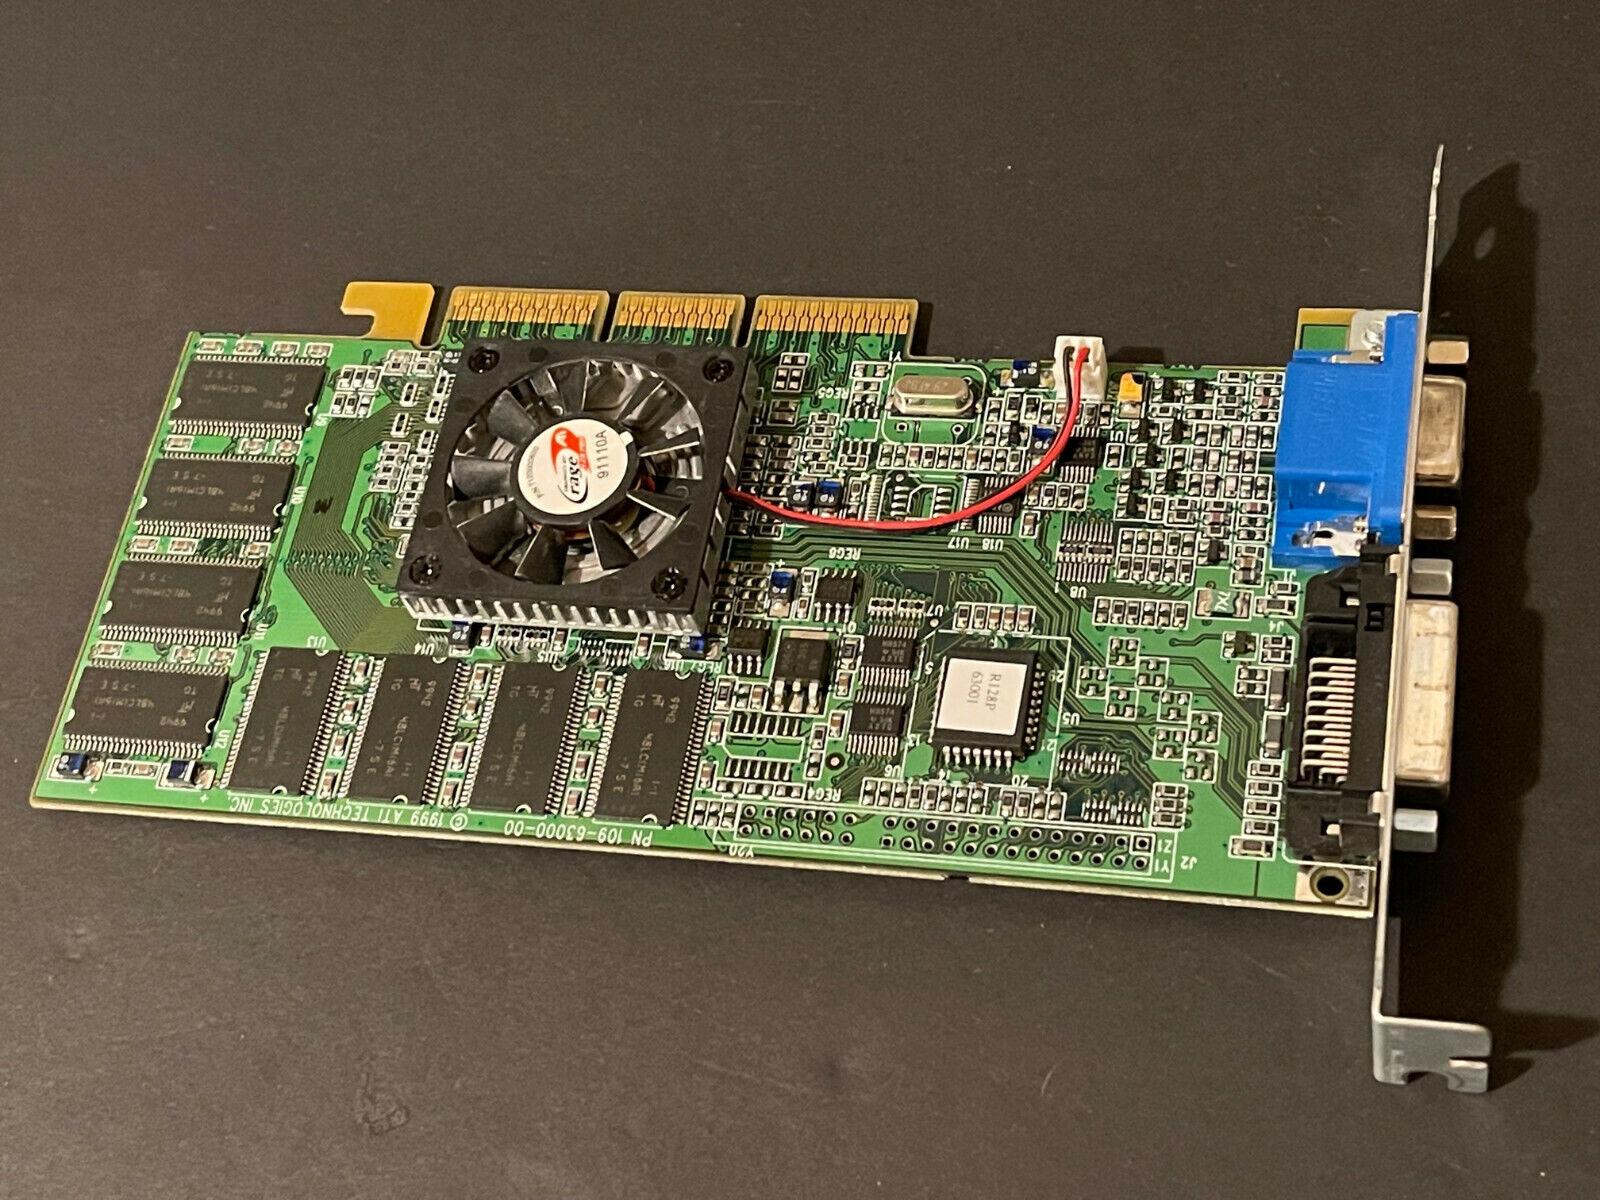 630-2906 Apple ATI Rage 128 Pro 16MB Video Graphics CARD NEW LAST ONE